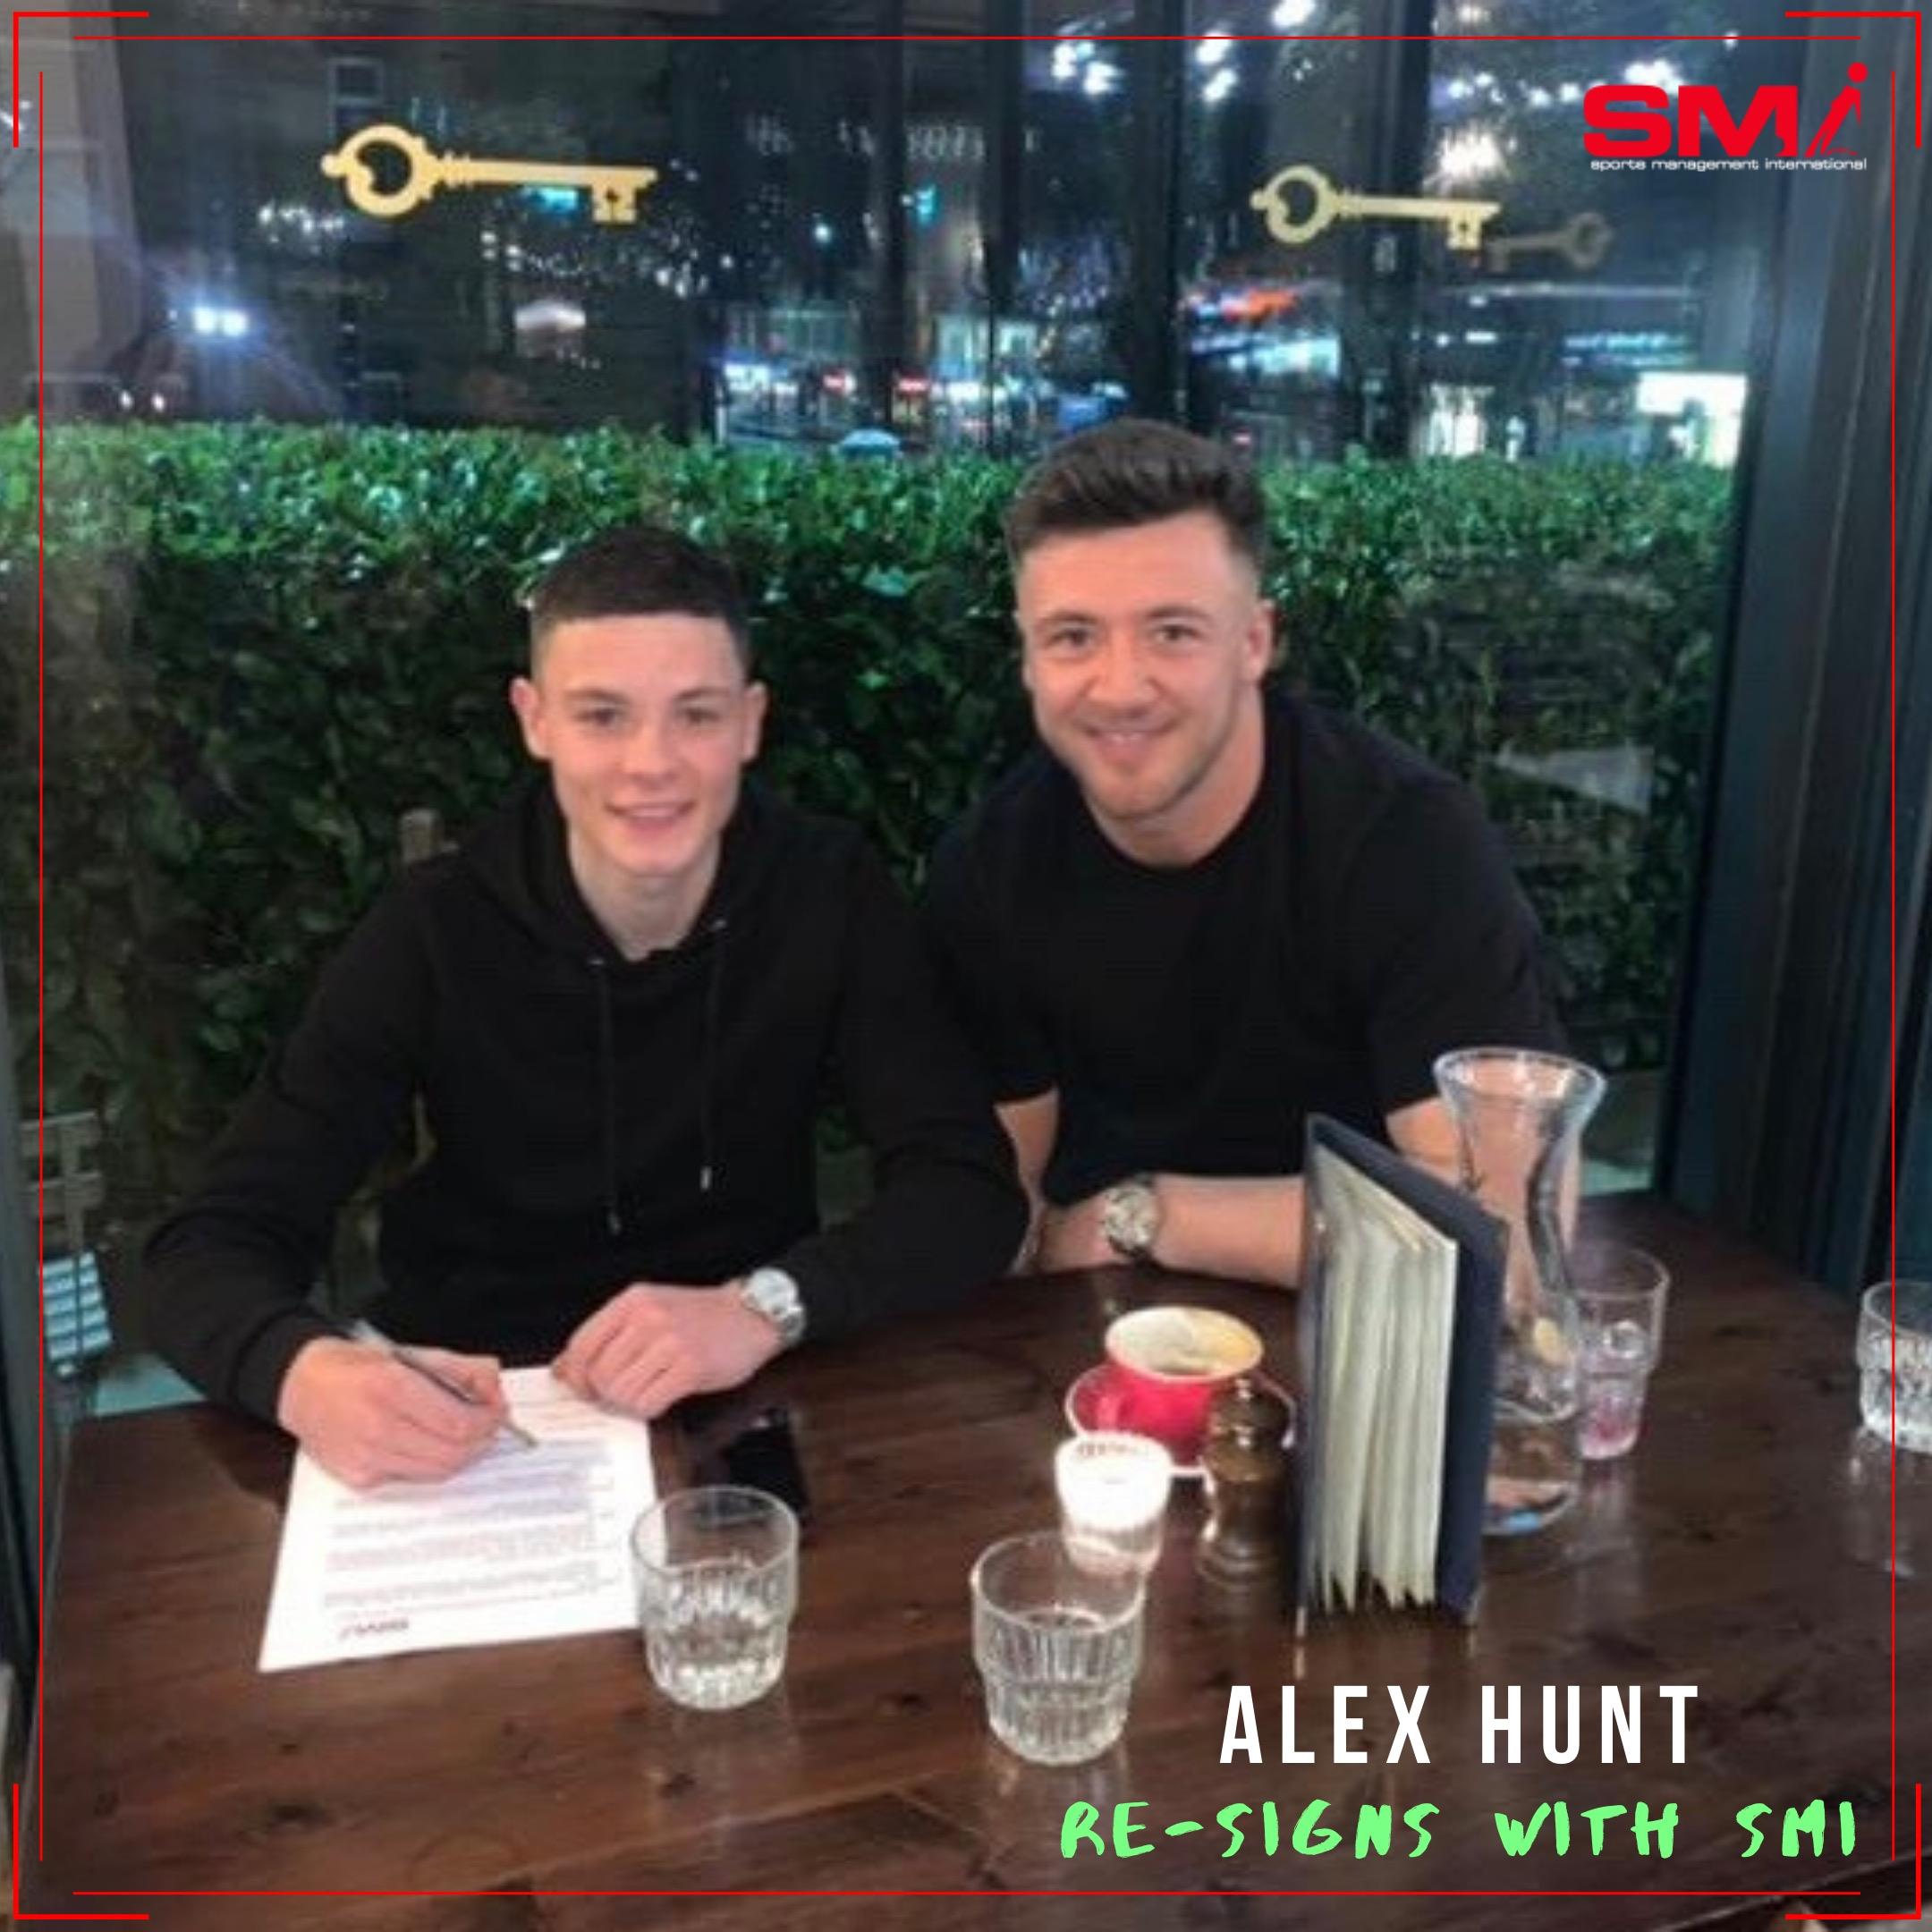 Alex Hunt re-signs